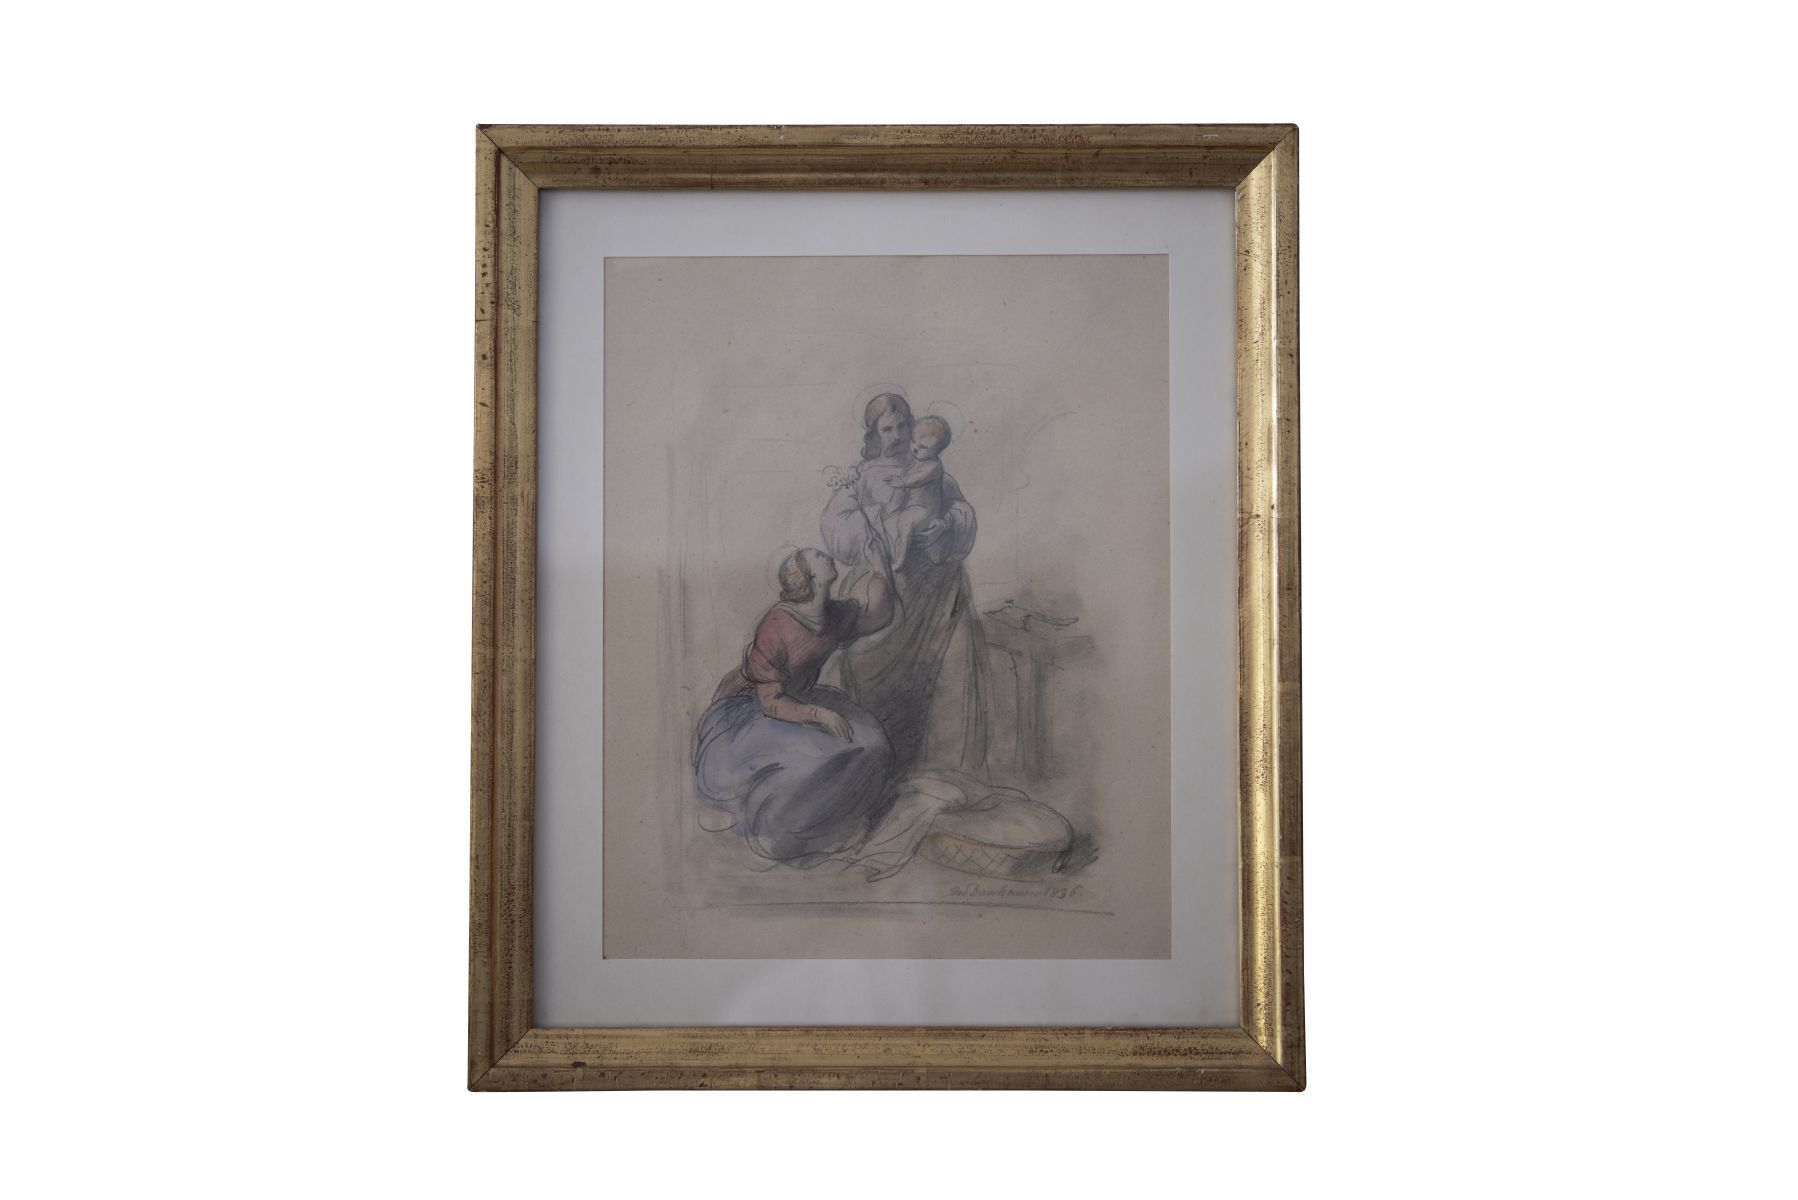 #112 Josef Danhauser (1805–1845), Holy Family, 1836, Vienna   Josef Danhauser (1805–1845), Heilige Familie, 1836, Wien Image